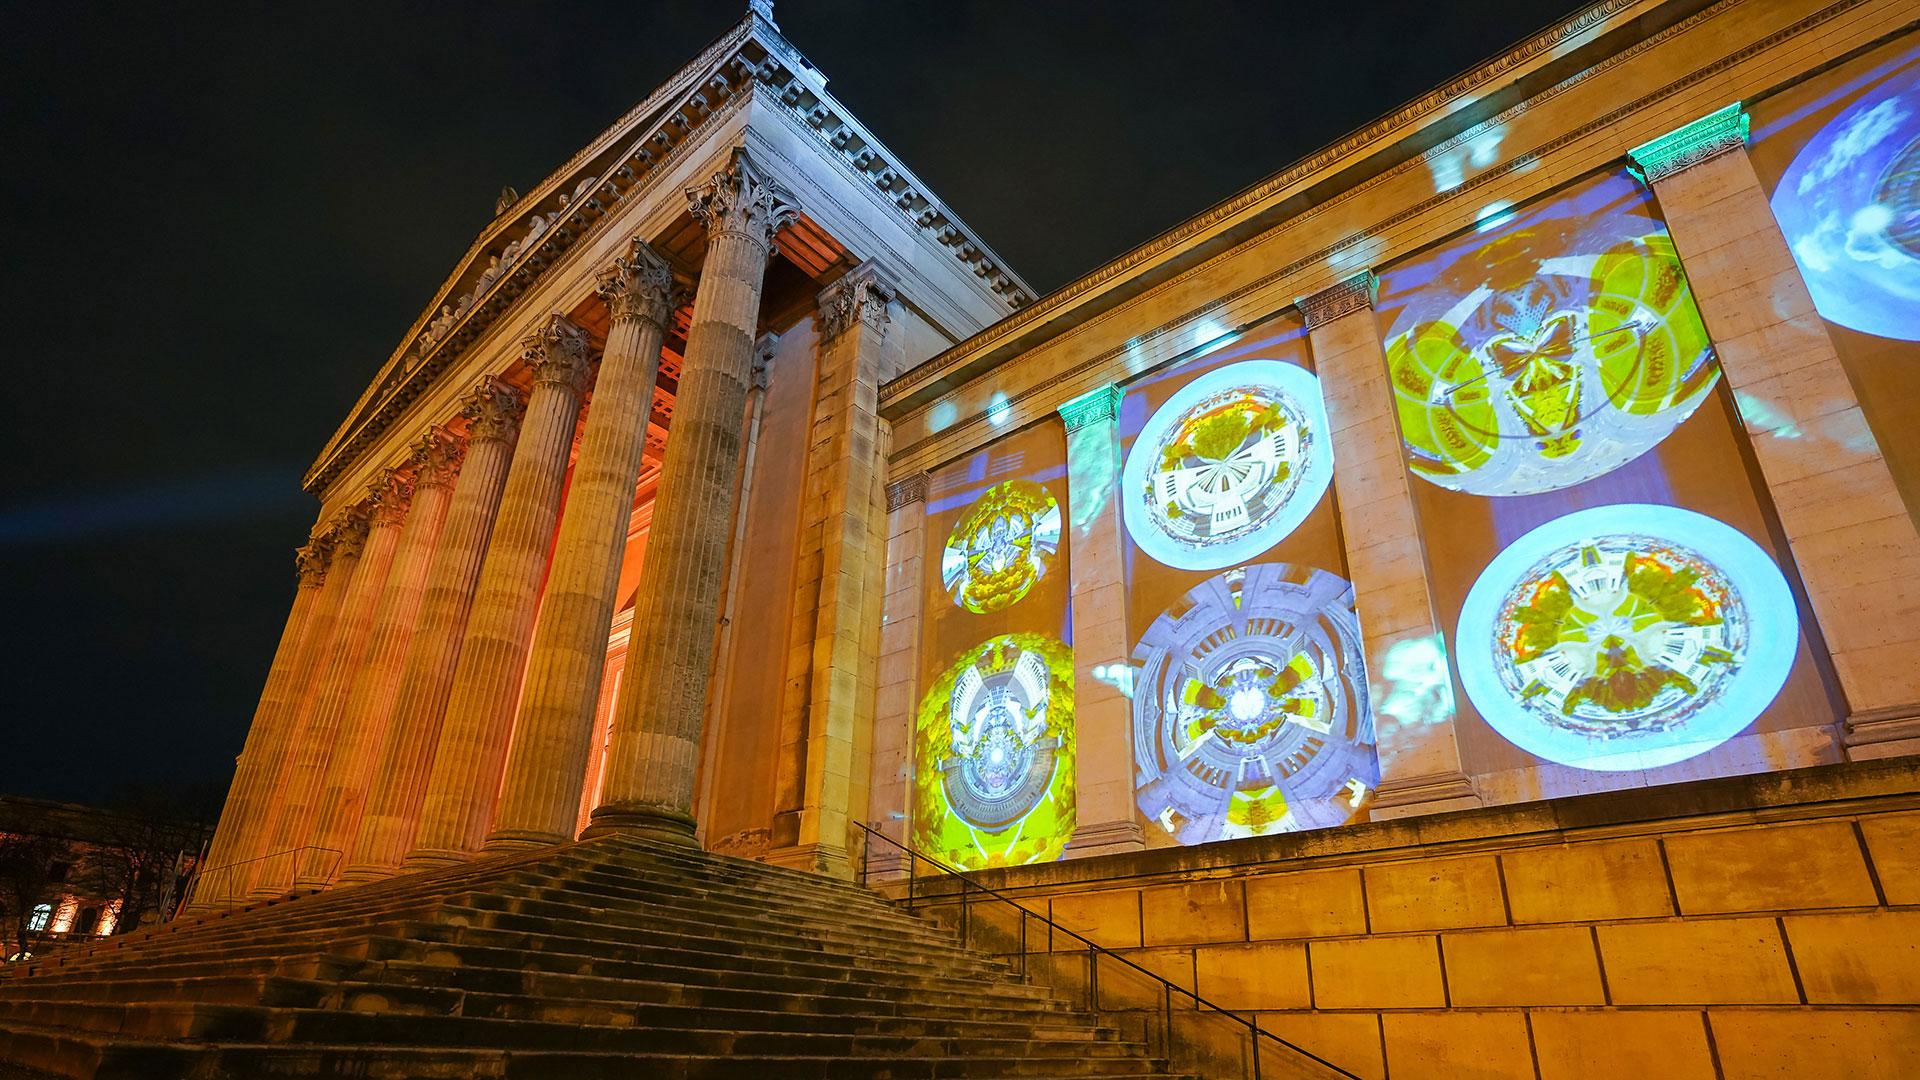 Antikensammlung Kunstareal verbindet